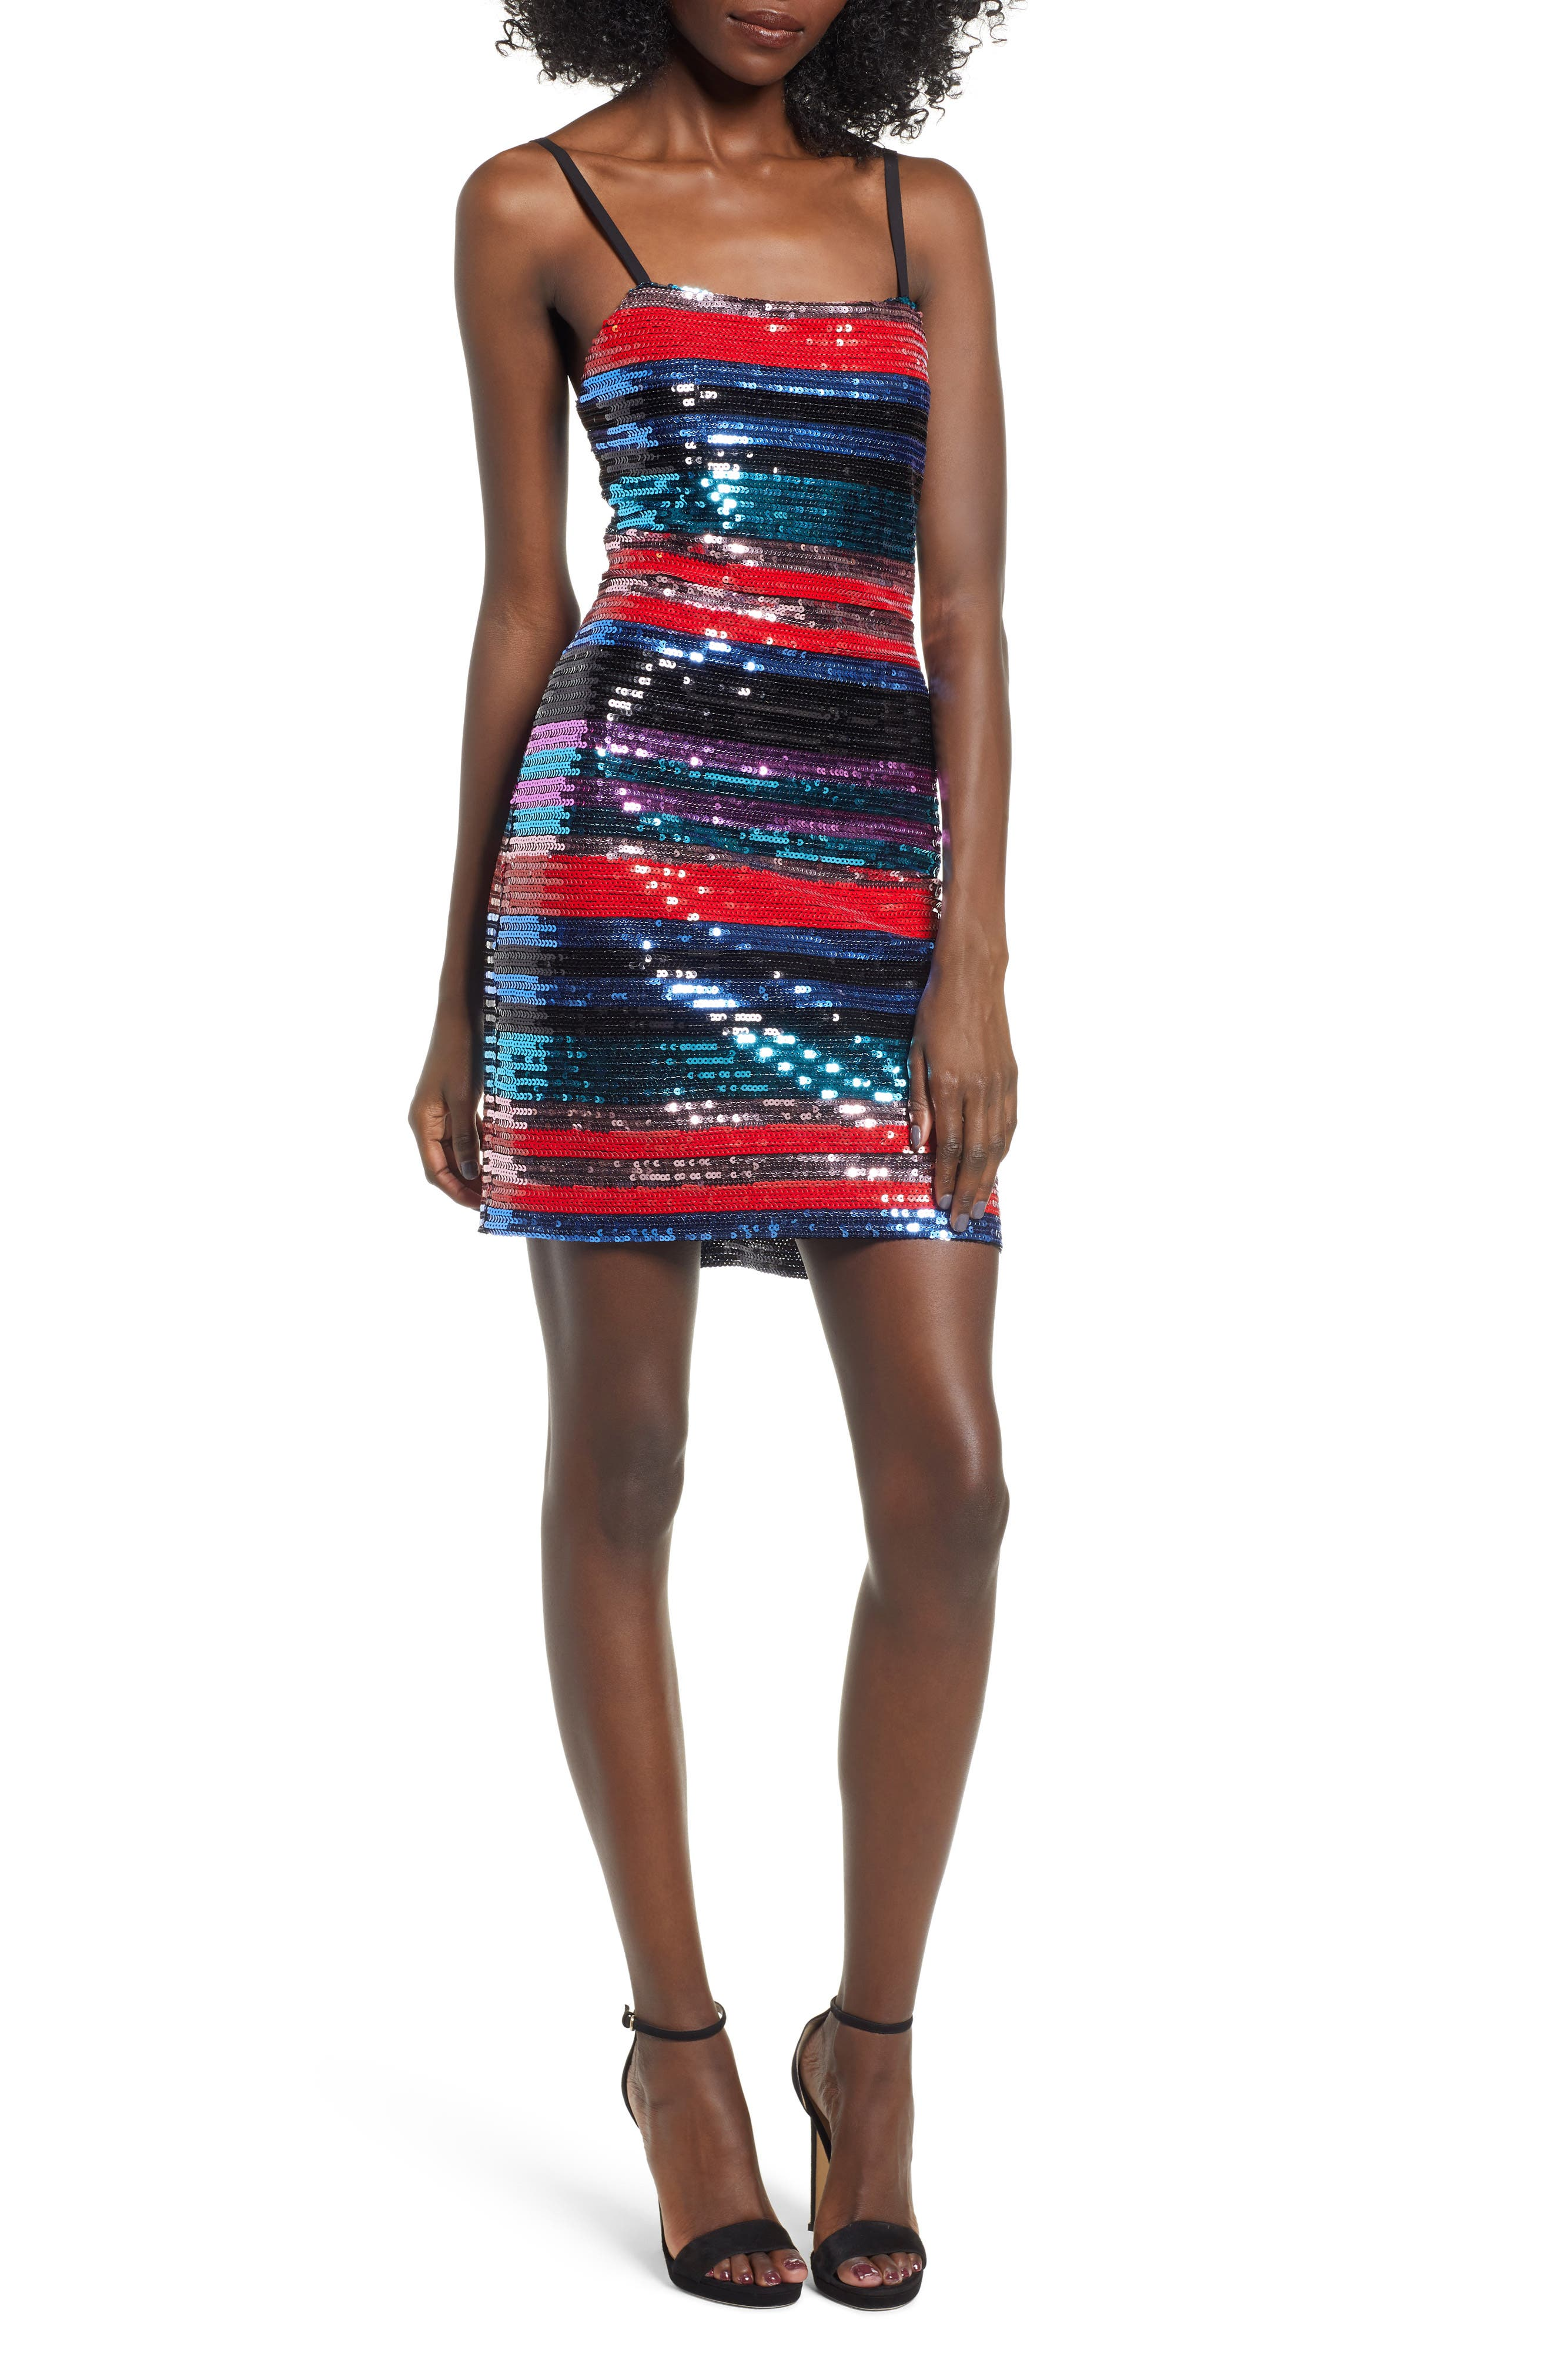 Manfi Lace-Up Back Sequin Stripe Minidress,                             Main thumbnail 1, color,                             RED SEQUIN STRIPE